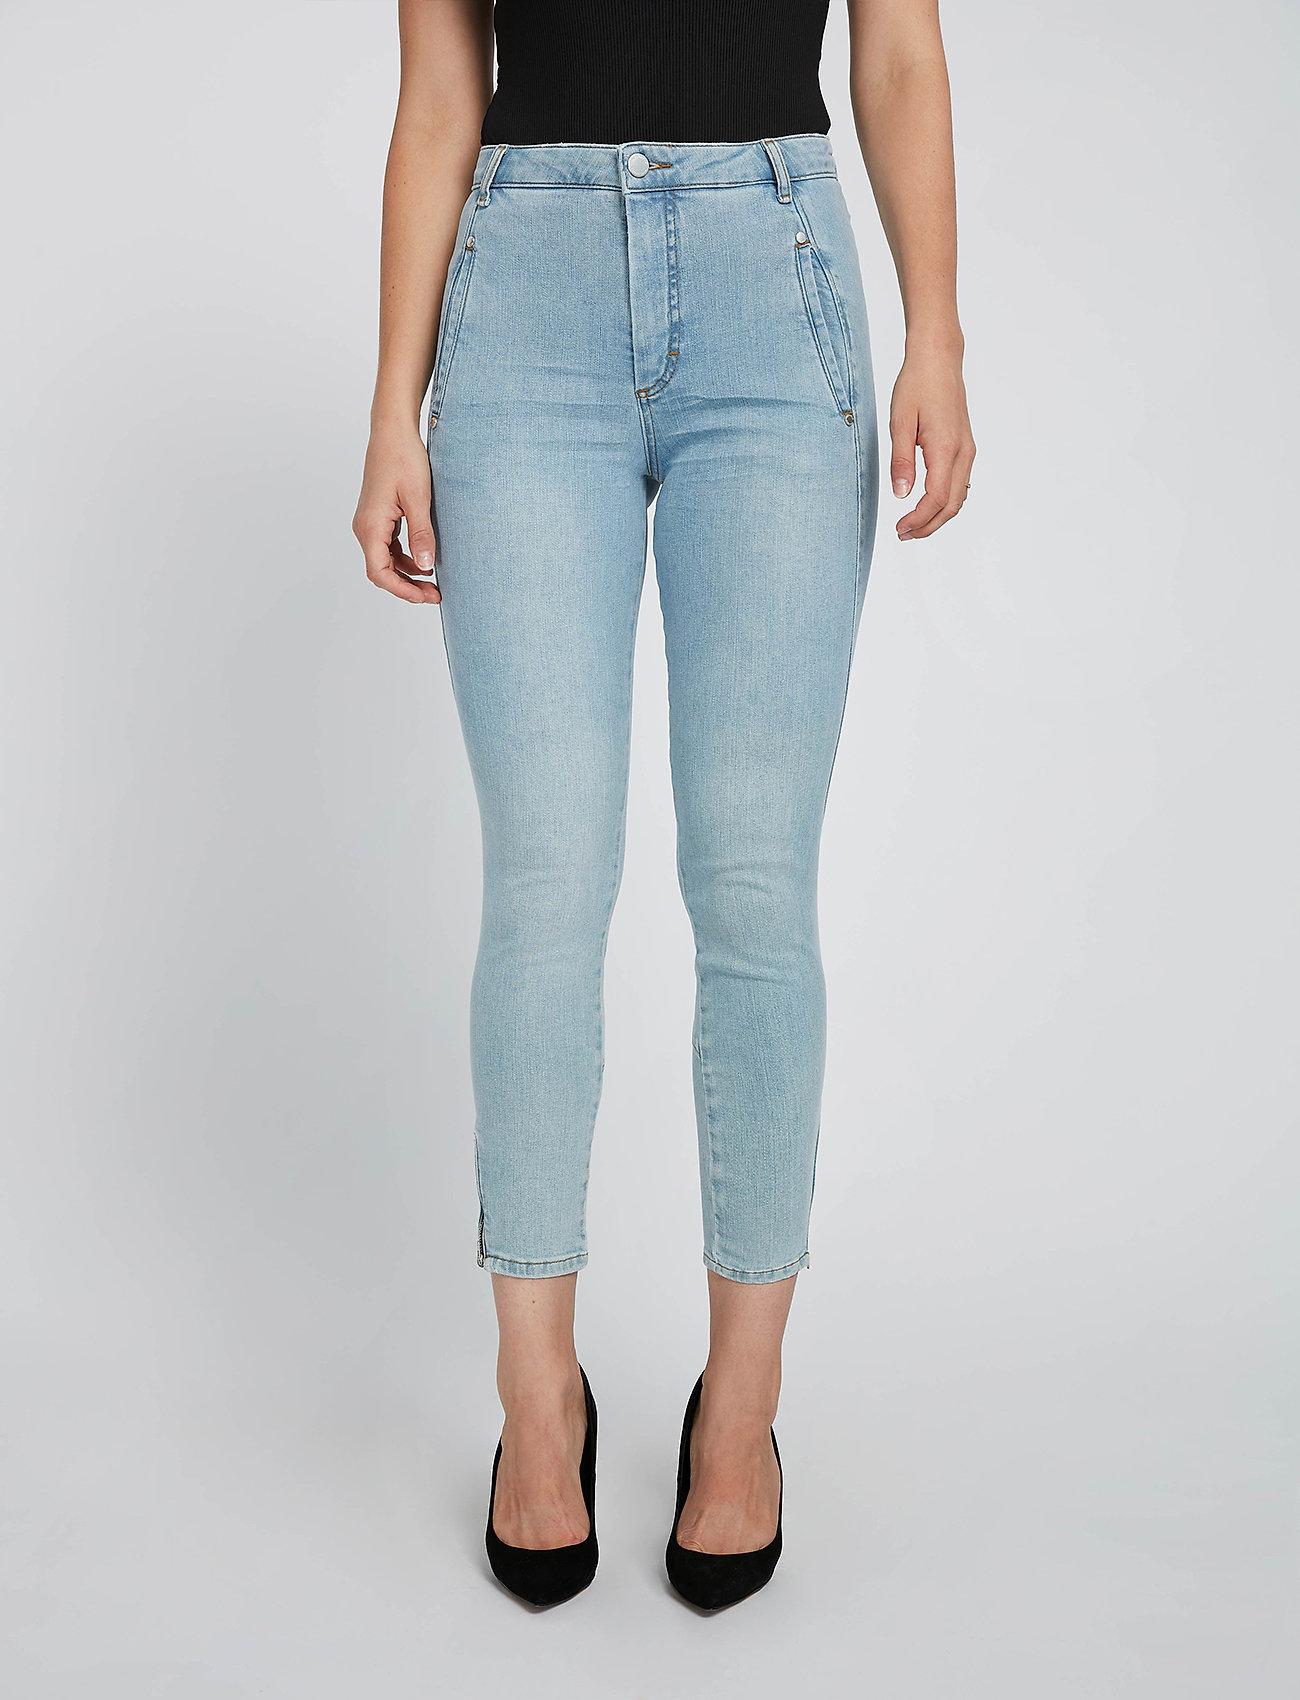 FIVEUNITS - Jolie Zip 241 - slim jeans - chalk blue - 0